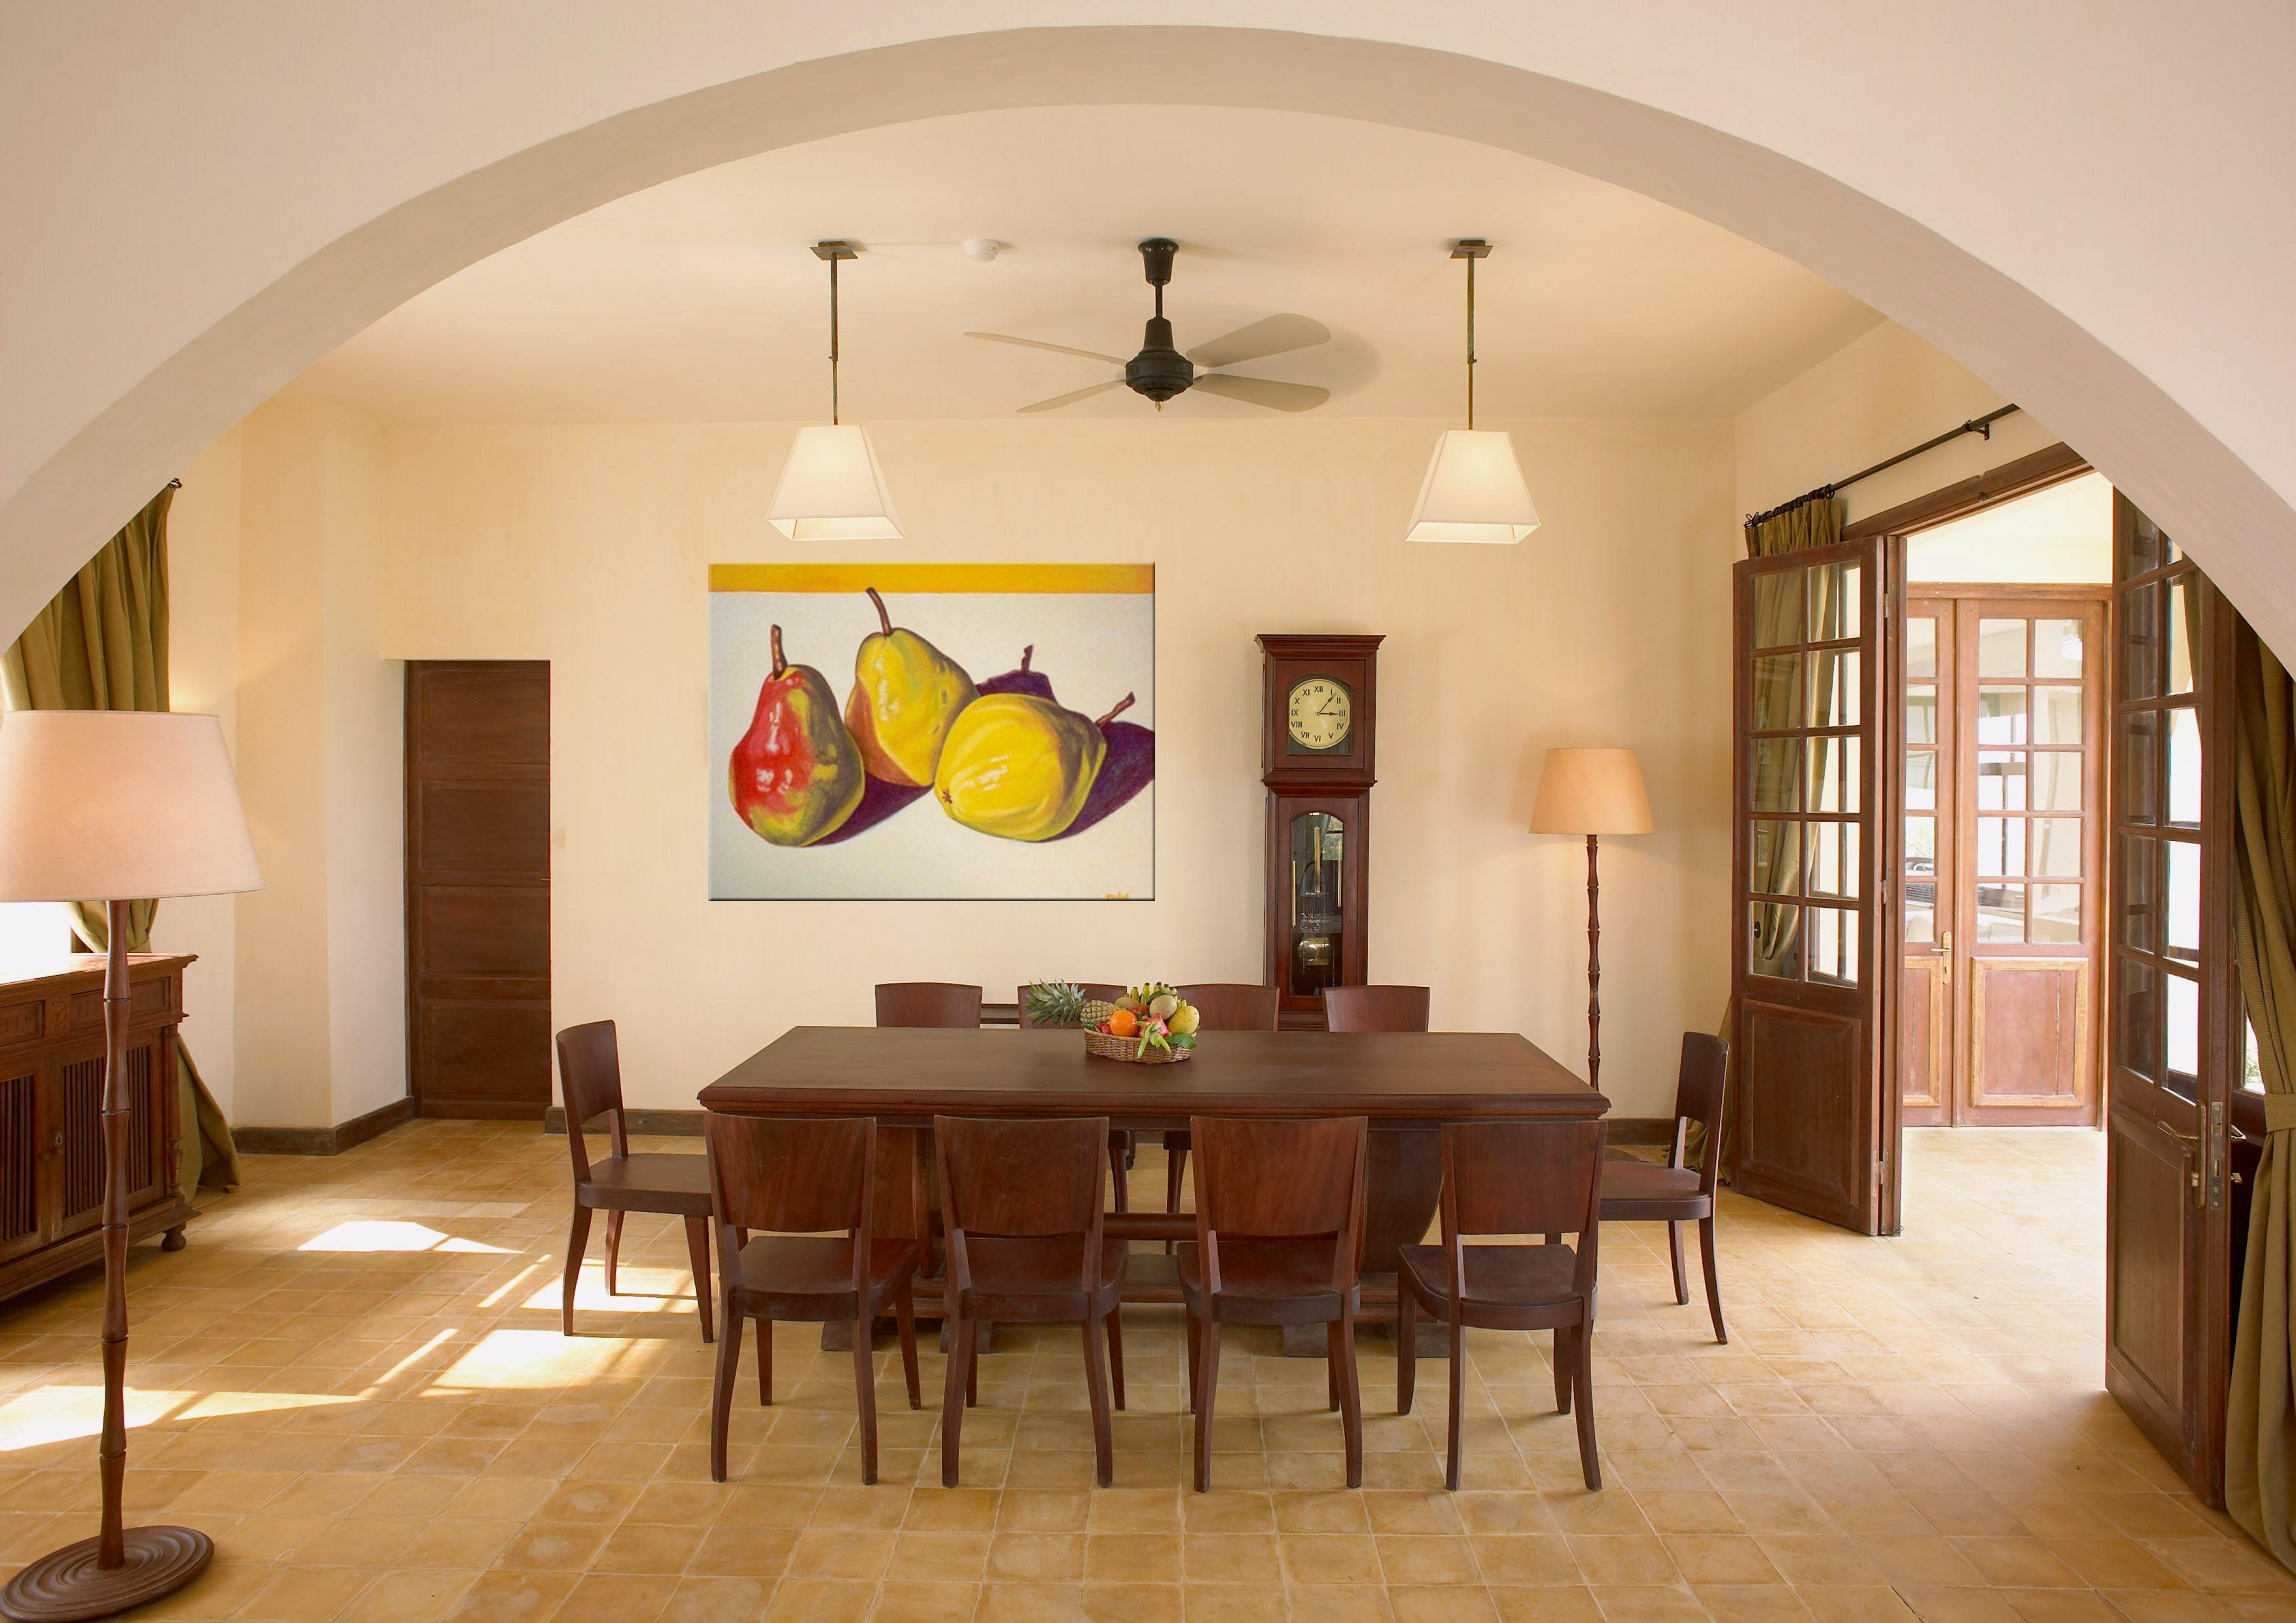 Exelent Modern Dining Room Wall Decor Motif - Wall Art Collections ...